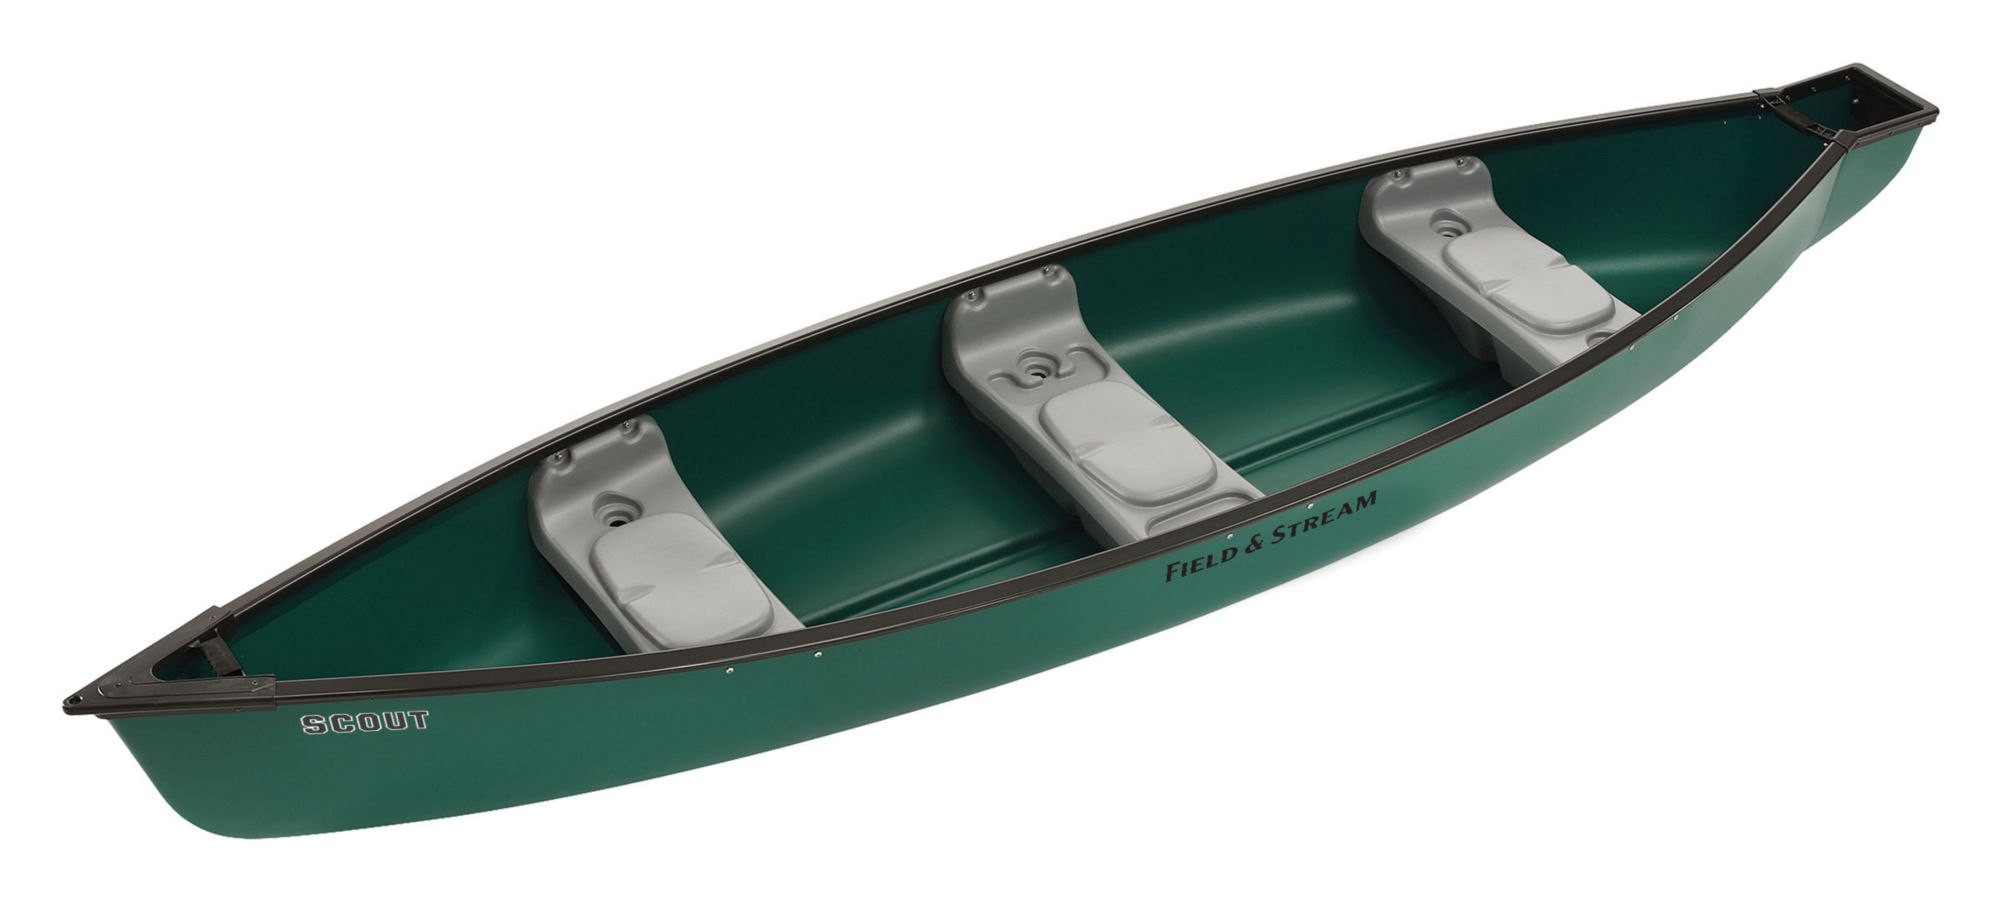 Canoes dicks sporting goods